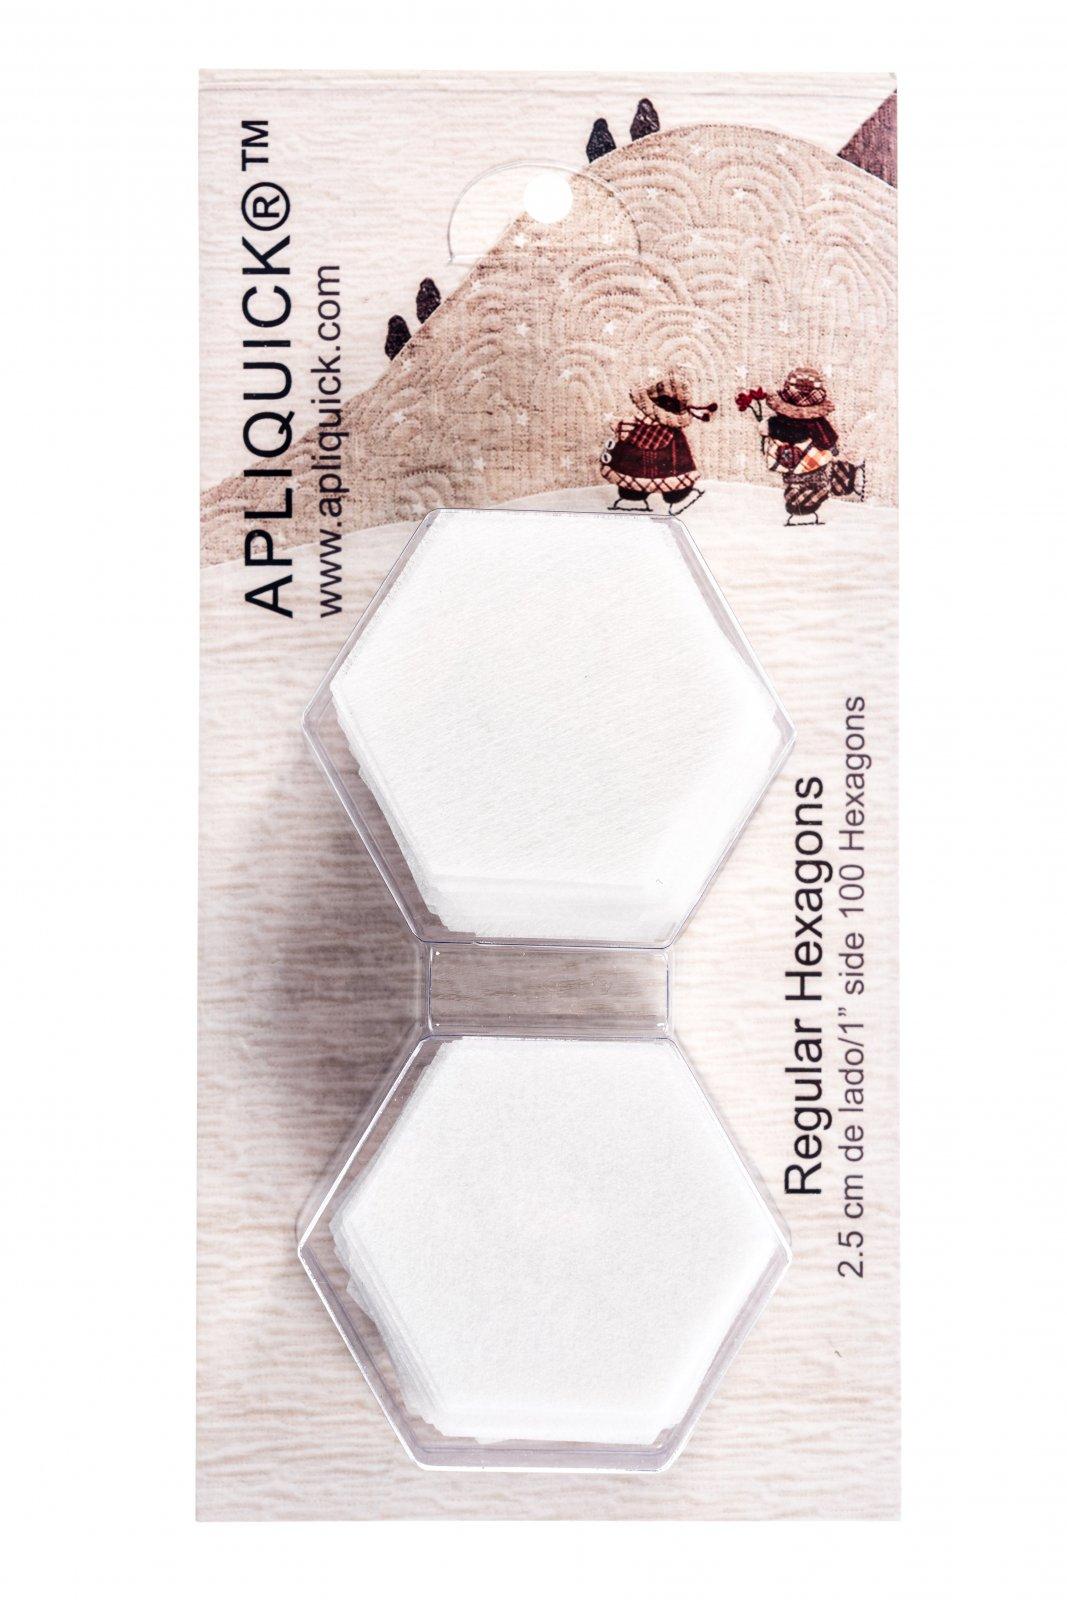 HX2 100 precut 2 CM Hexagons per package Apliquick